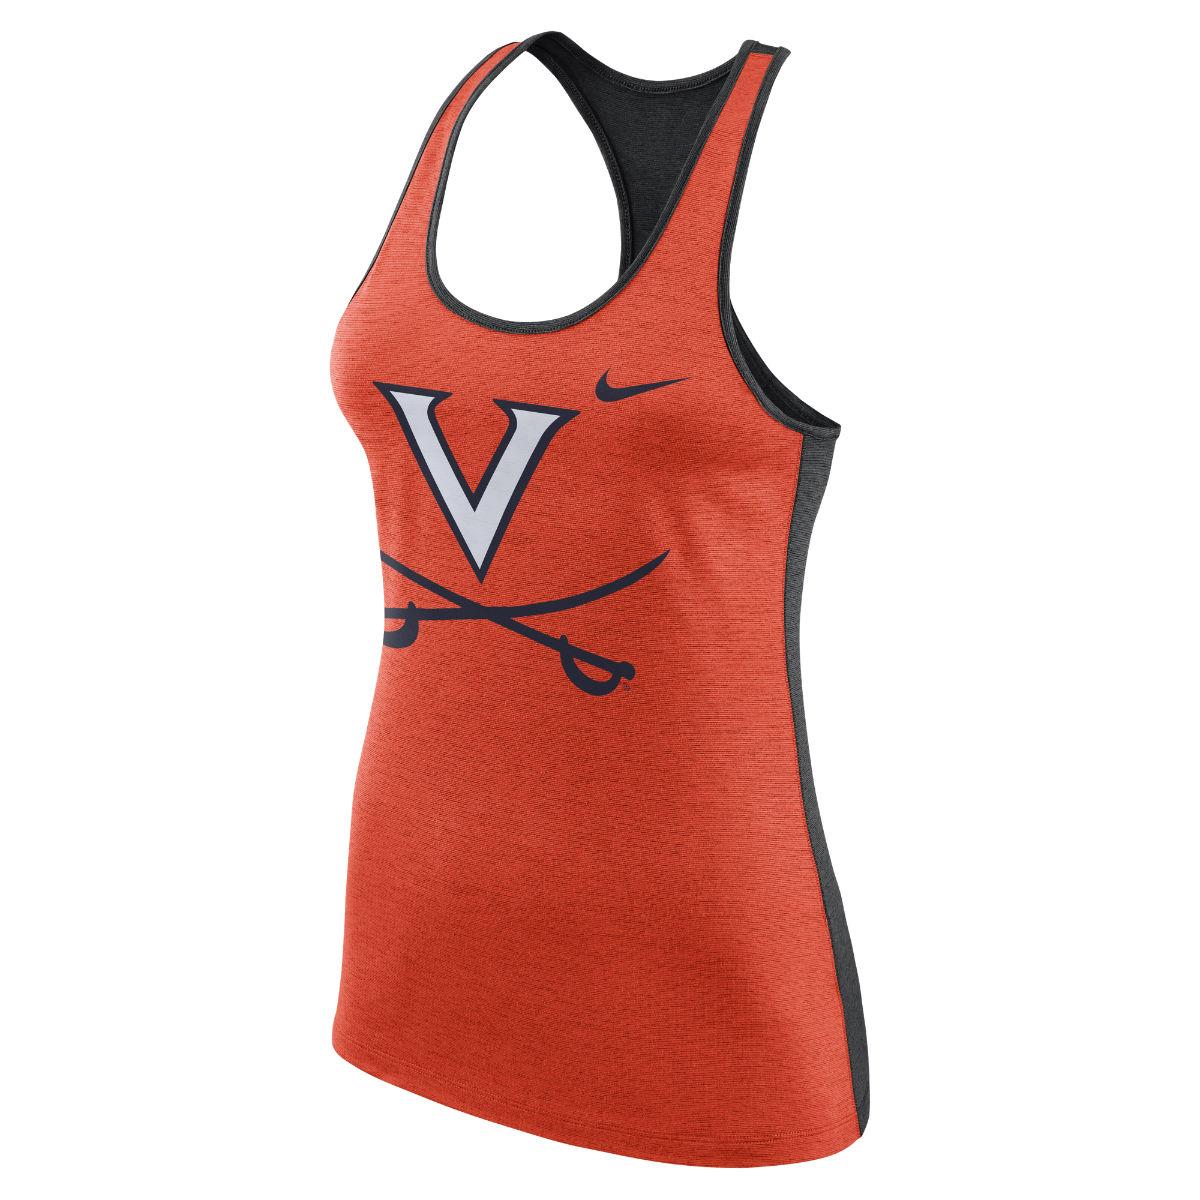 University of Virginia V-sabre Ladies Dri-Fit NIKE Tank